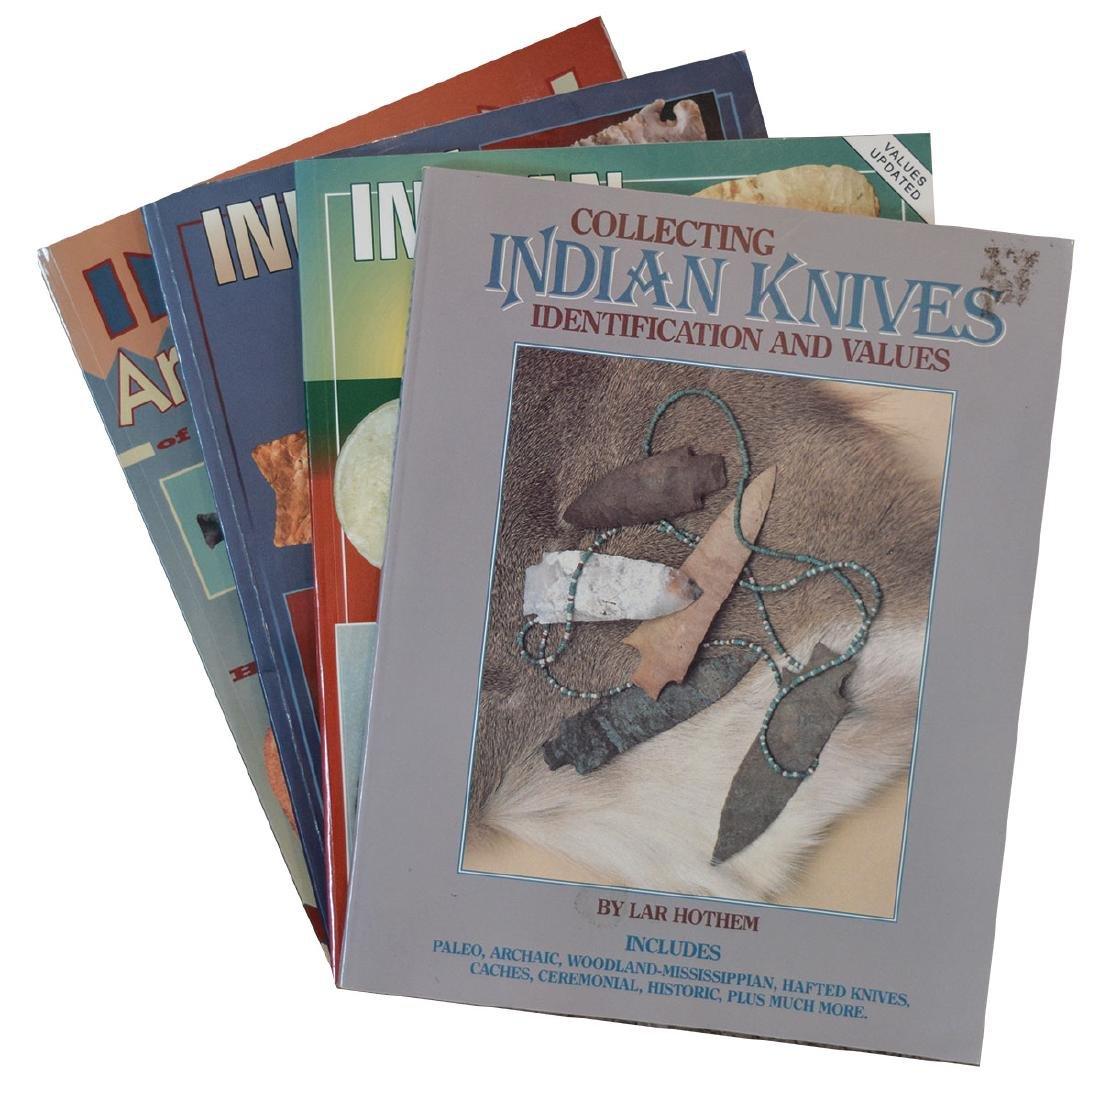 4 Hothem Books.  Volumes I, II and III of IAM